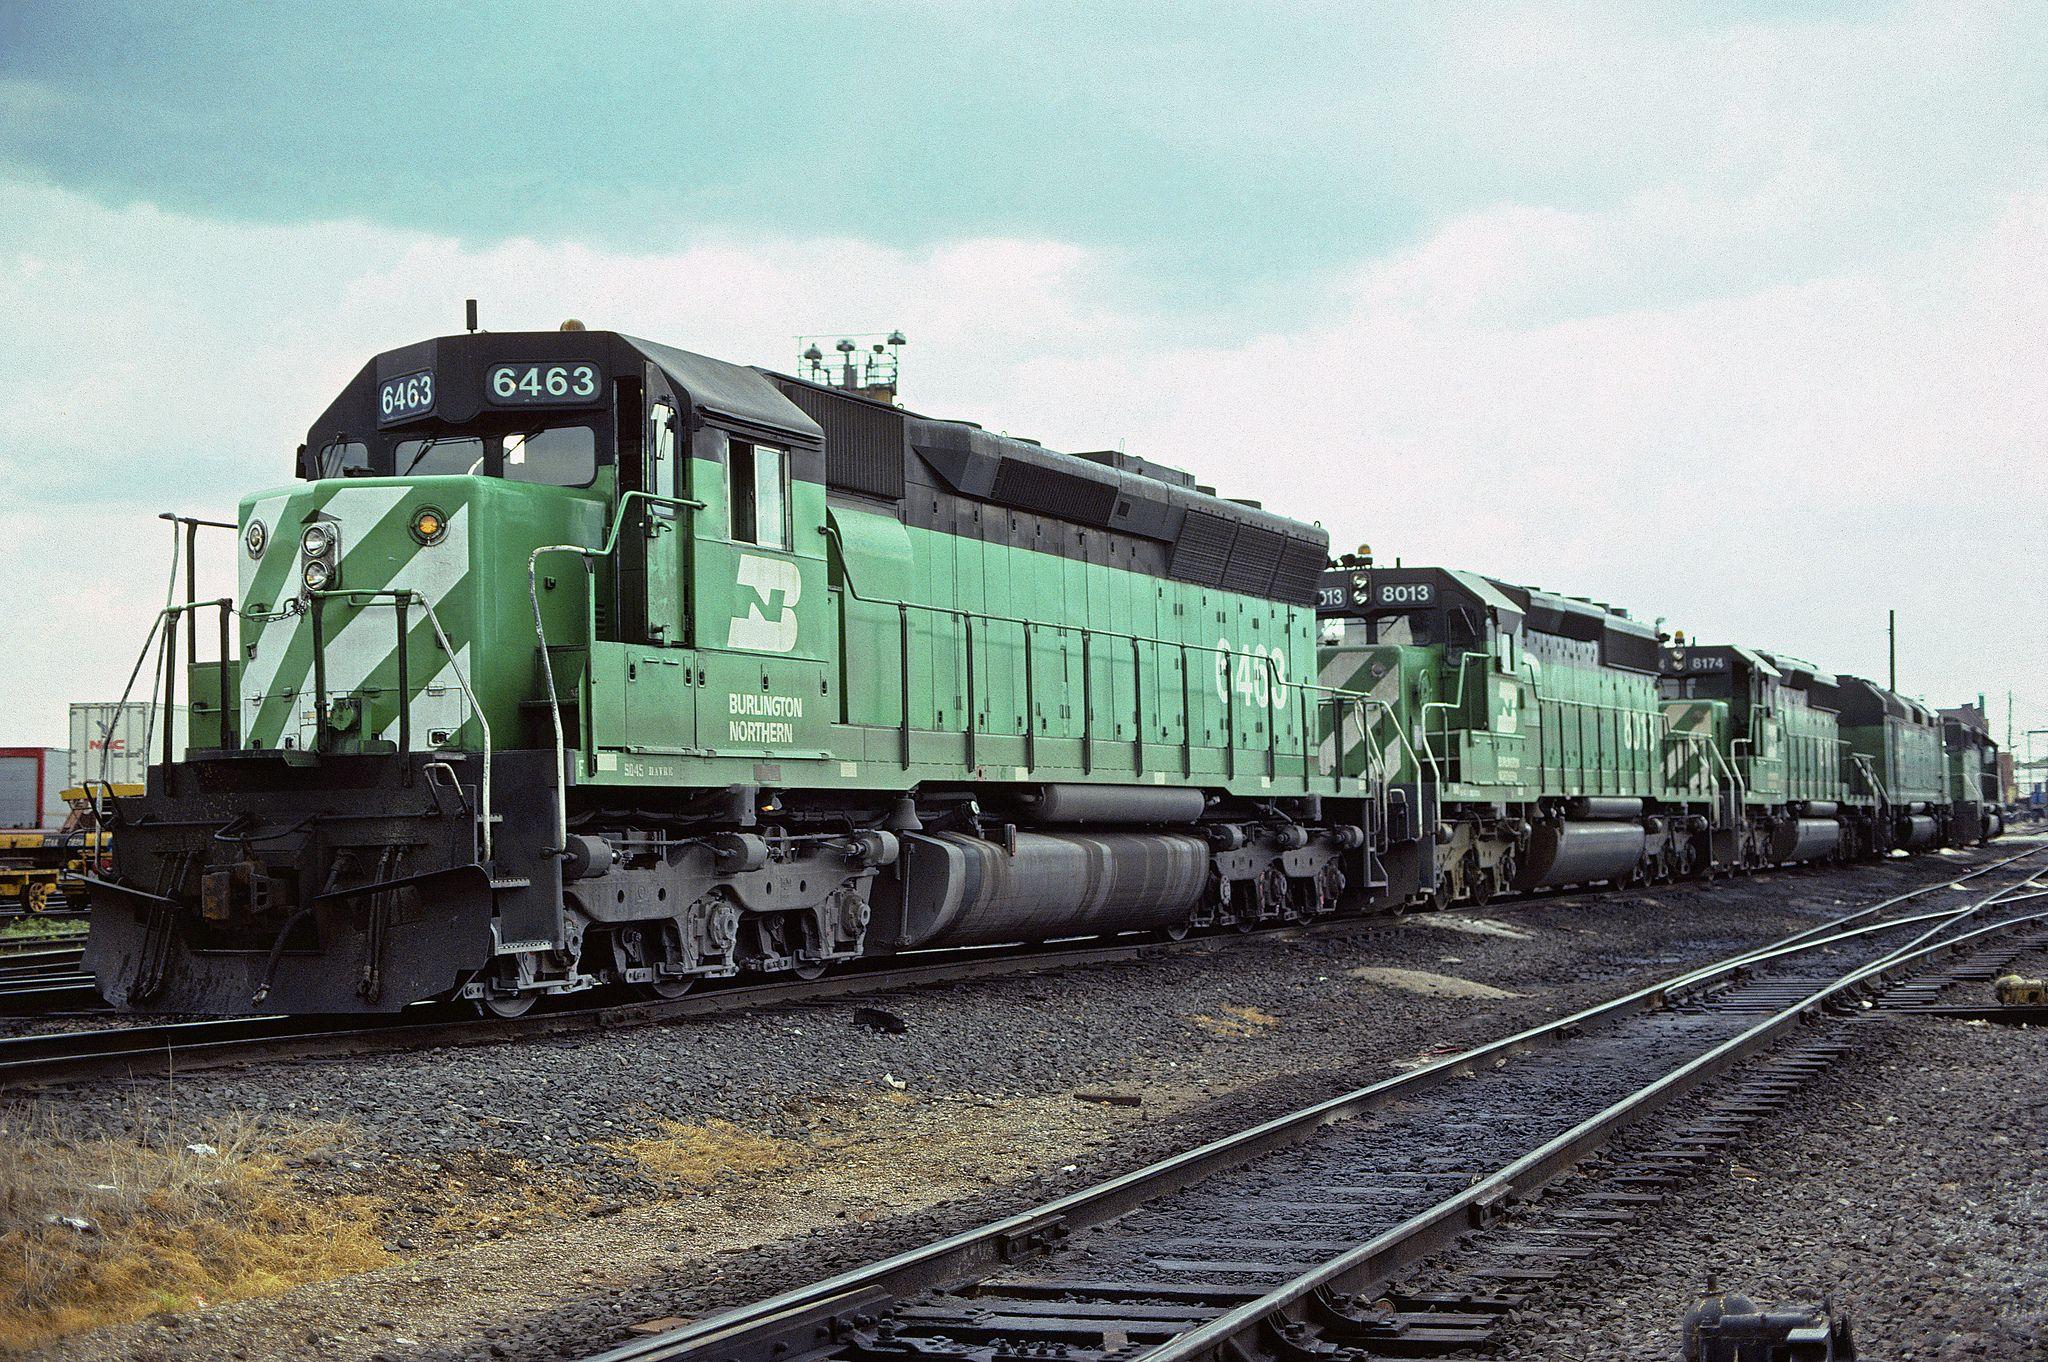 https://flic.kr/p/xrj947 | BN SD45 6463 | Burlington Northern Railroad SD45 6463 at Clyde, Illinois on June 21, 1982, Kodachrome by Chuck Zeiler.